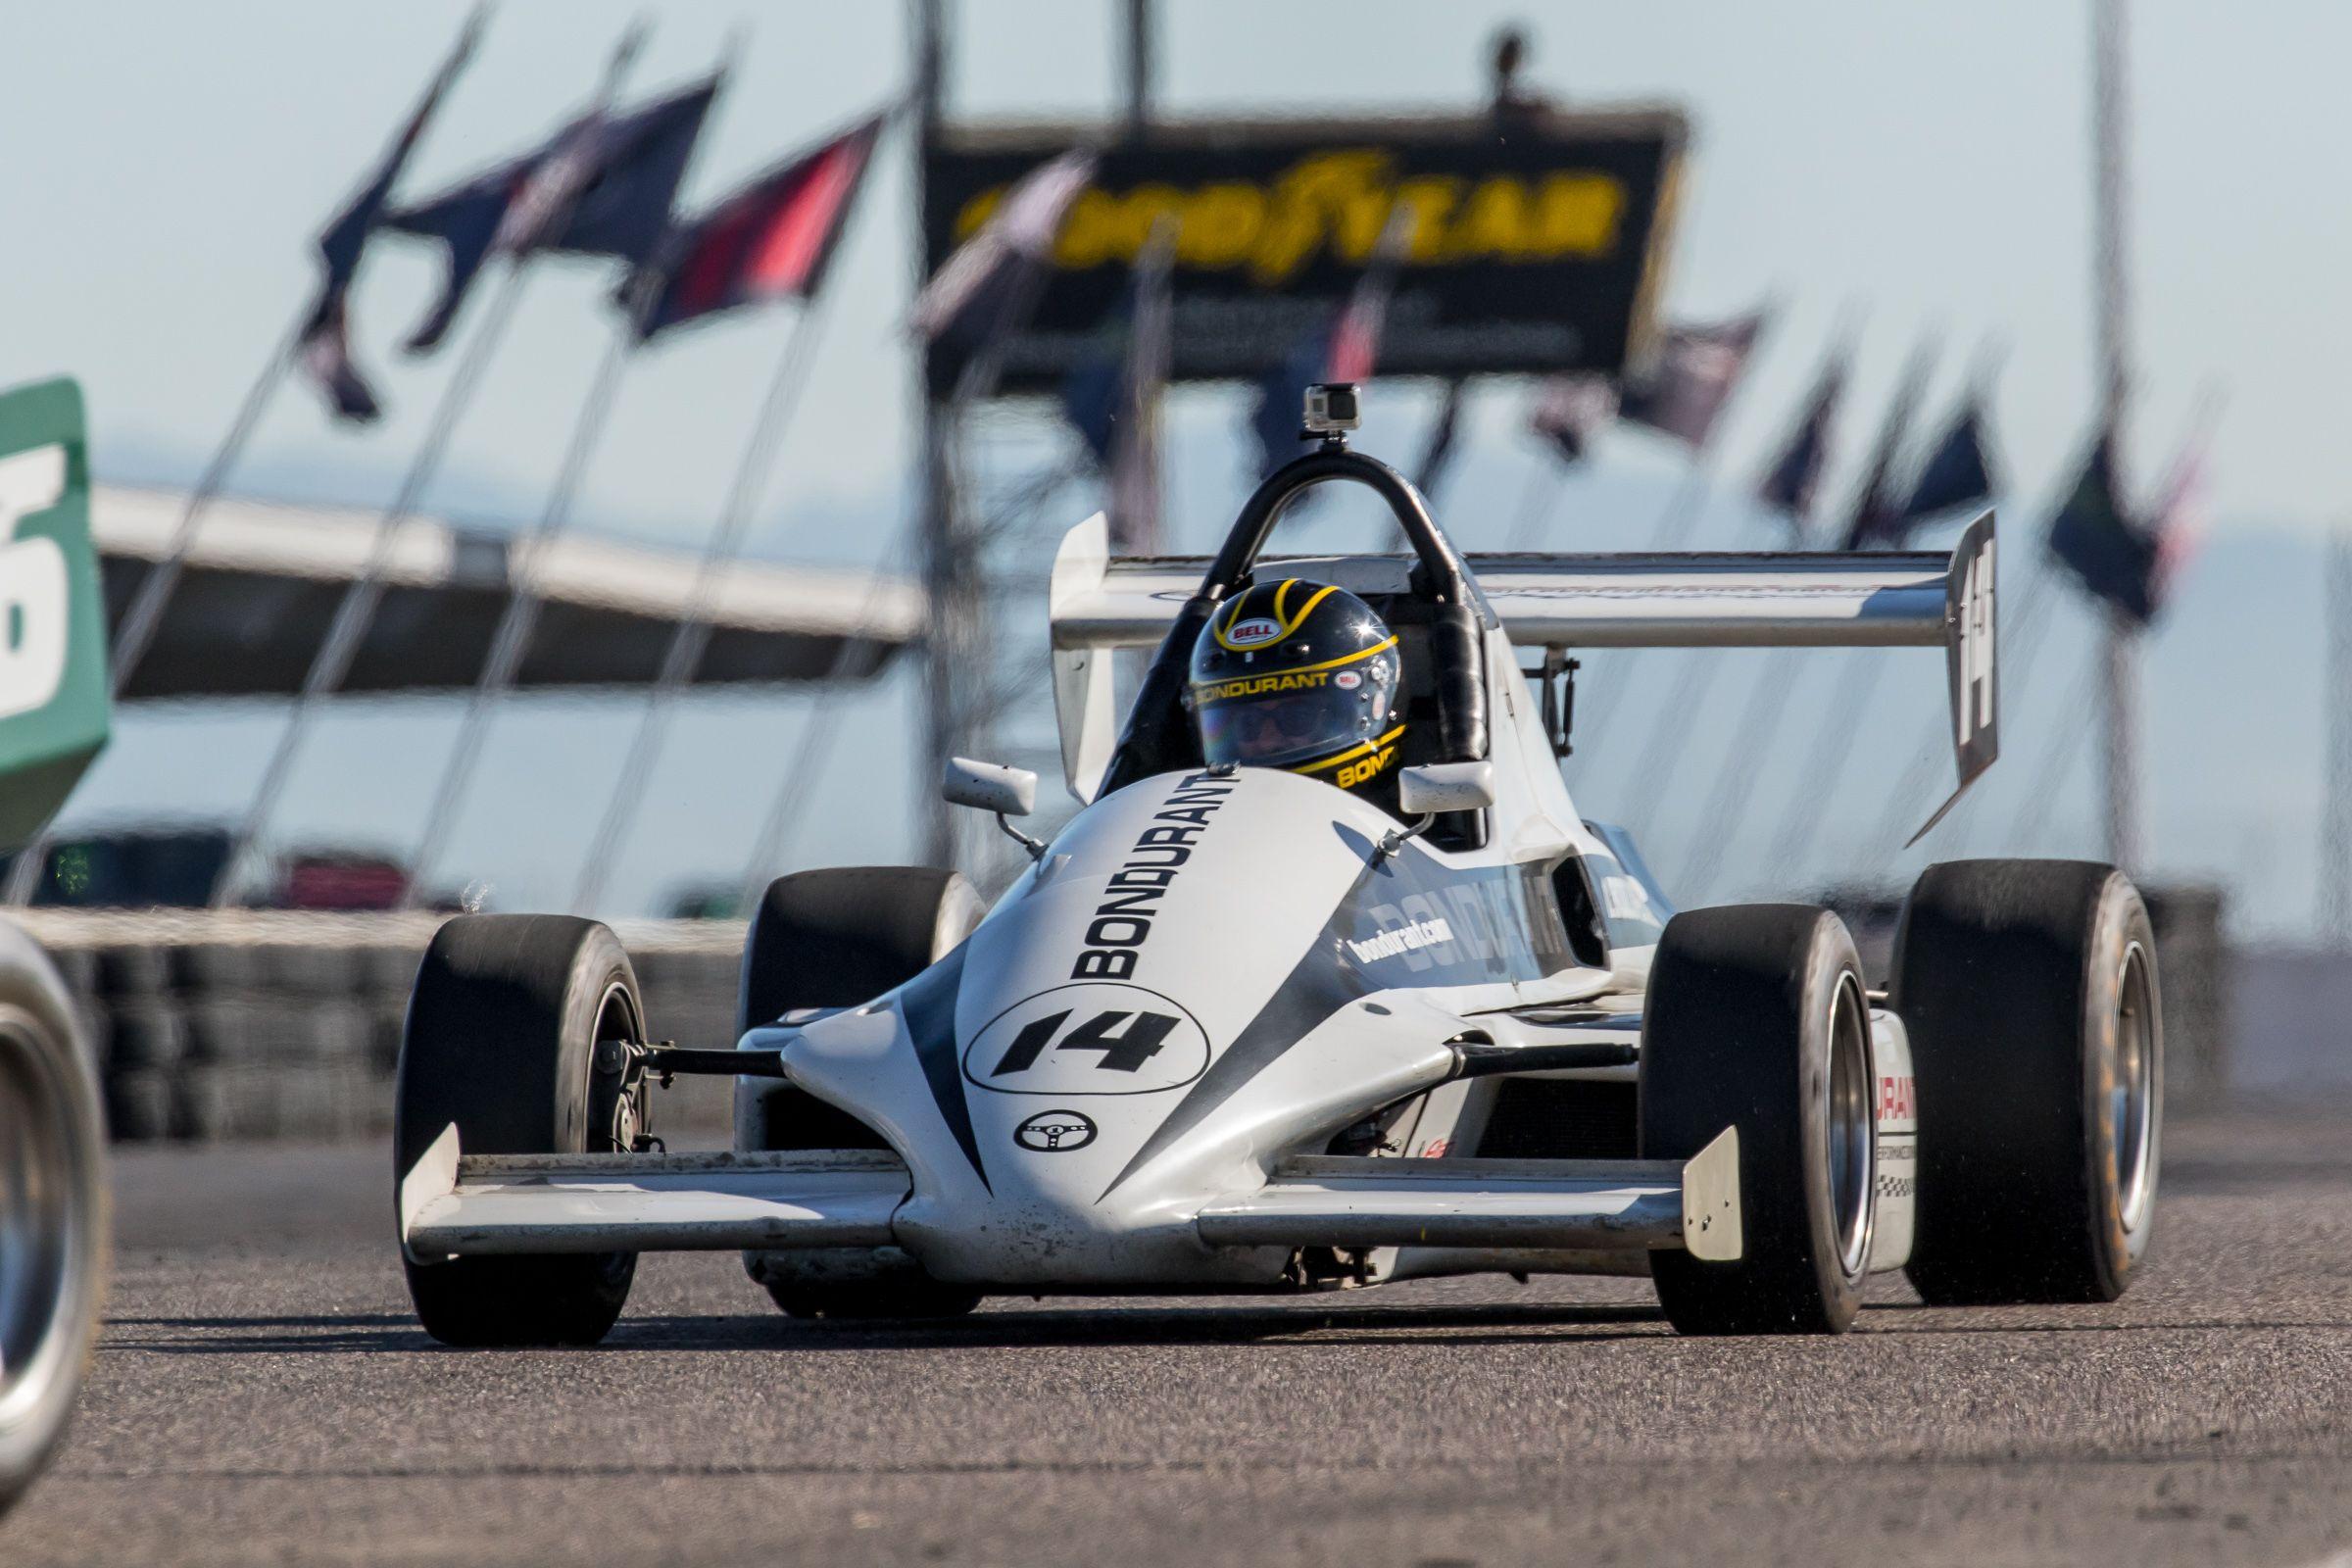 Formula Mazda At Bondurant Speedway Inches Away From Other Formula - Formula mazda